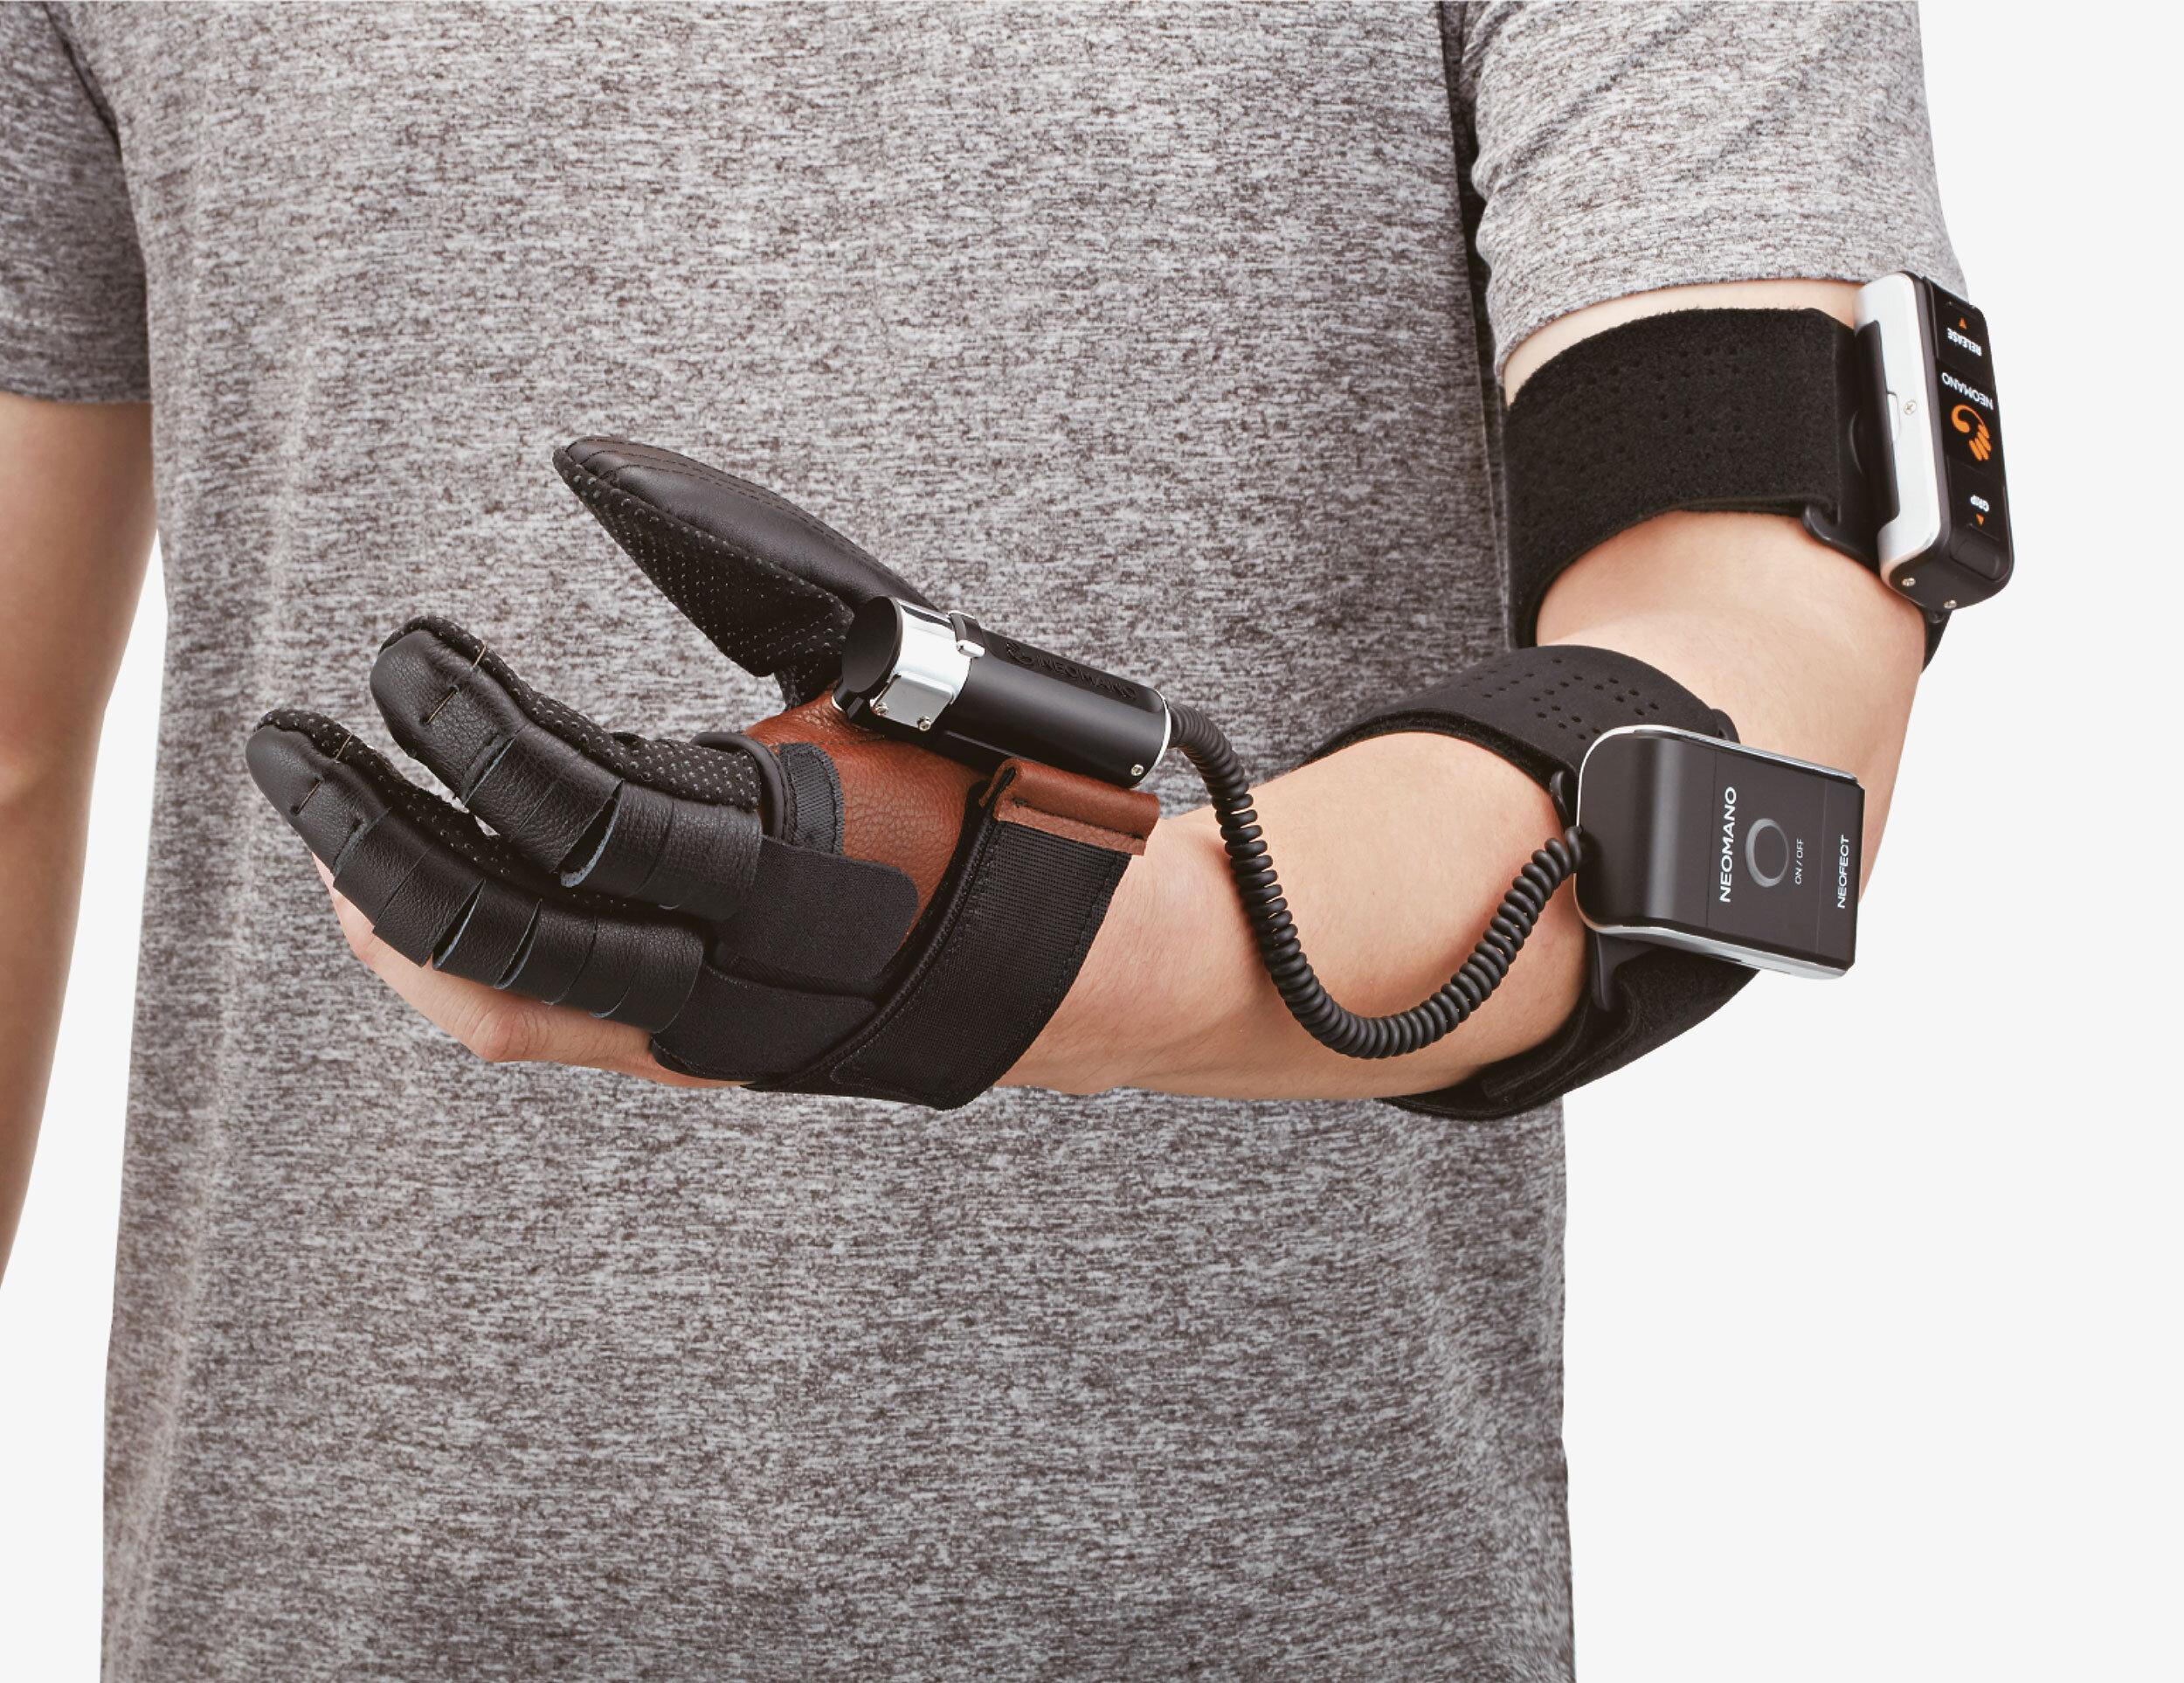 NeoMano,-Powerful-Wearable-Robotic-Glove.jpg